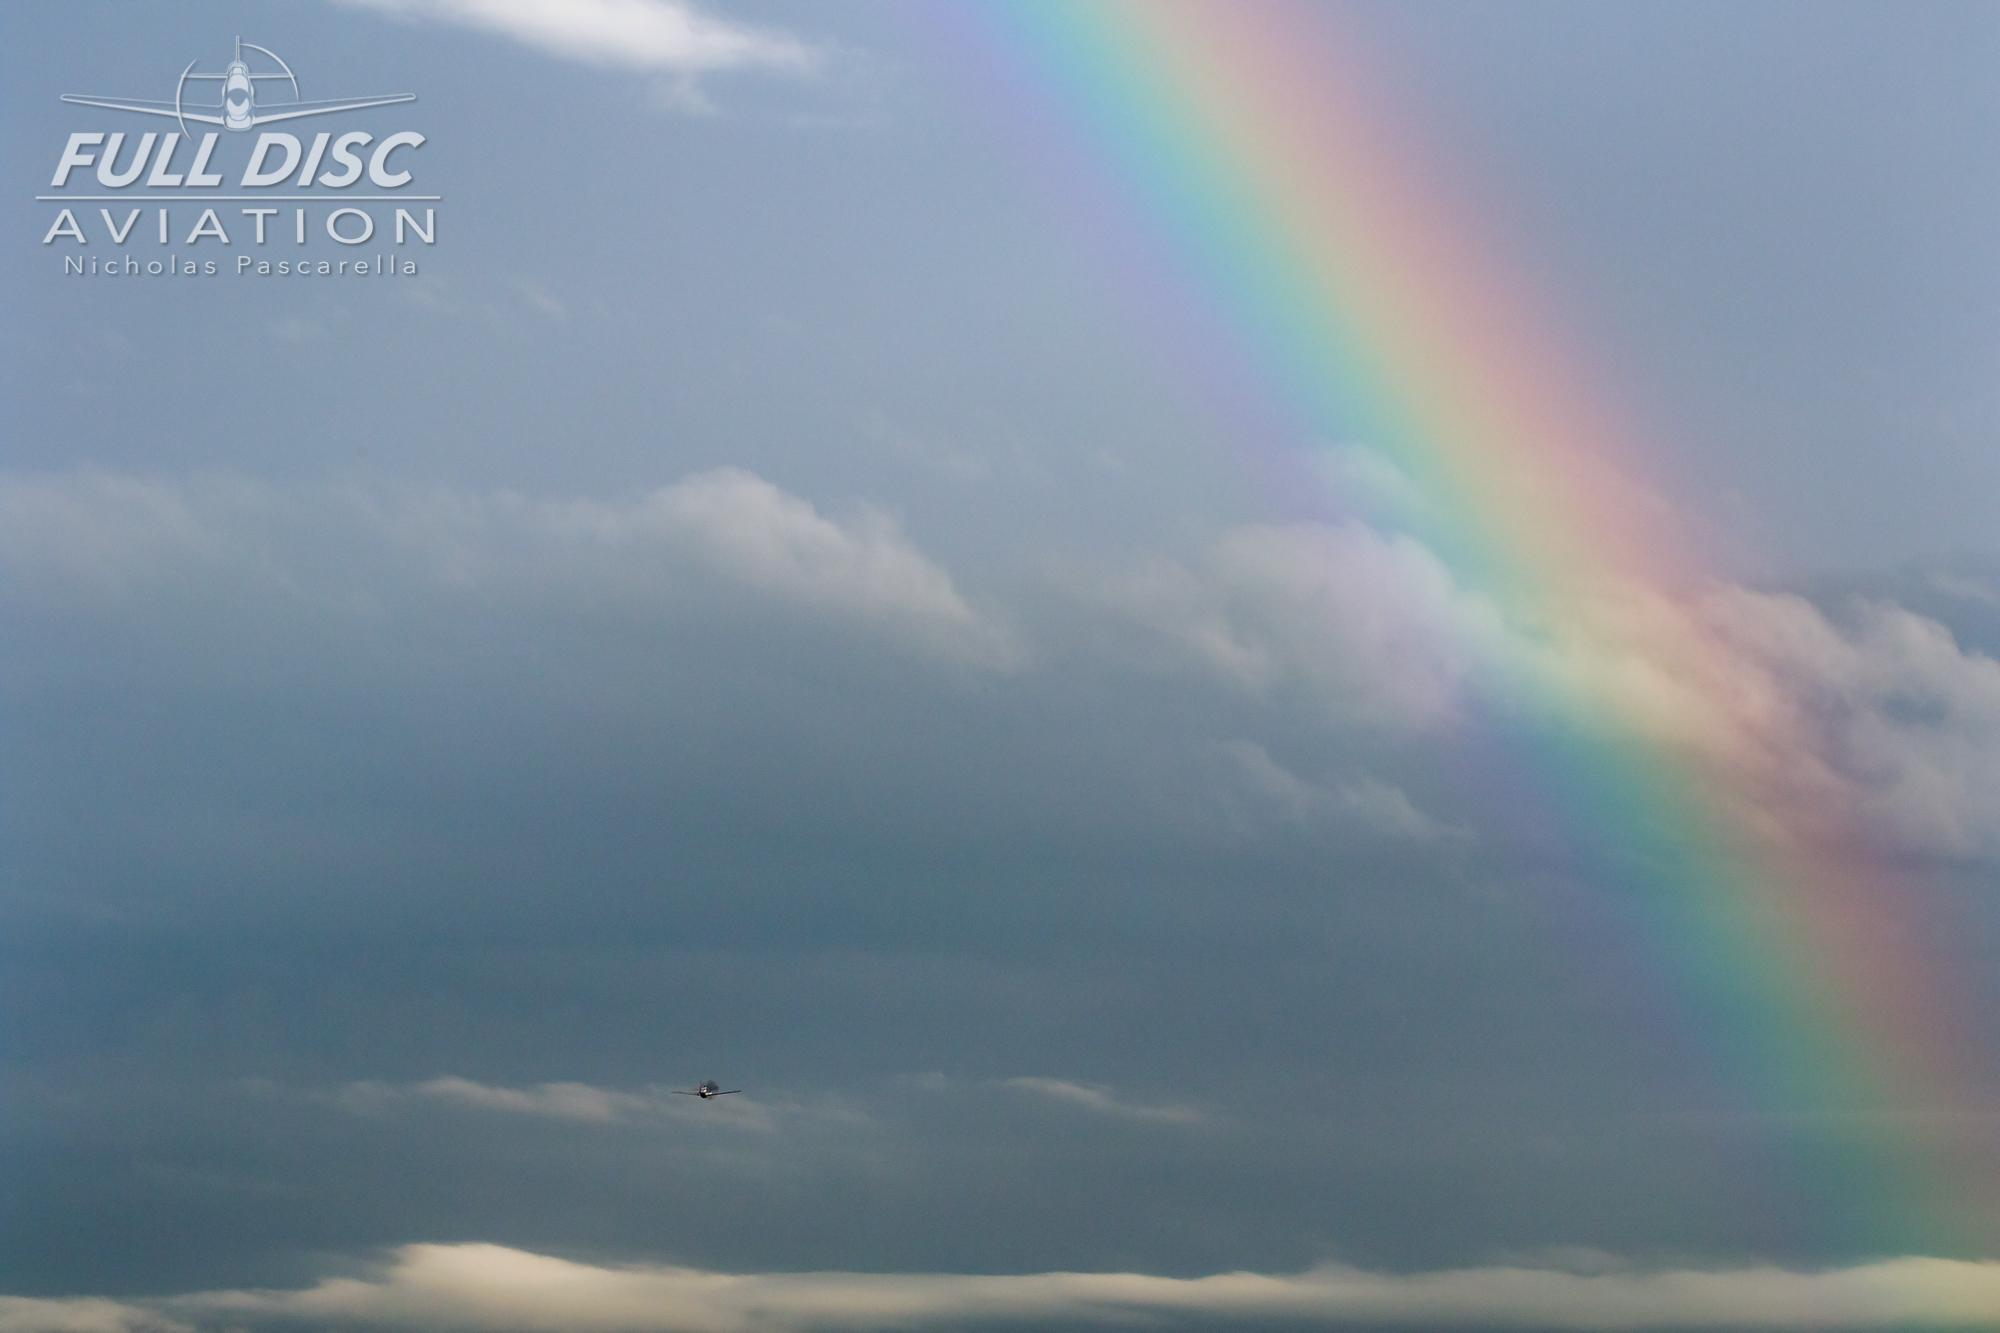 mustang_rainbow_andrewmckenna_fulldiscaviation_nickpascarella_p51.jpg